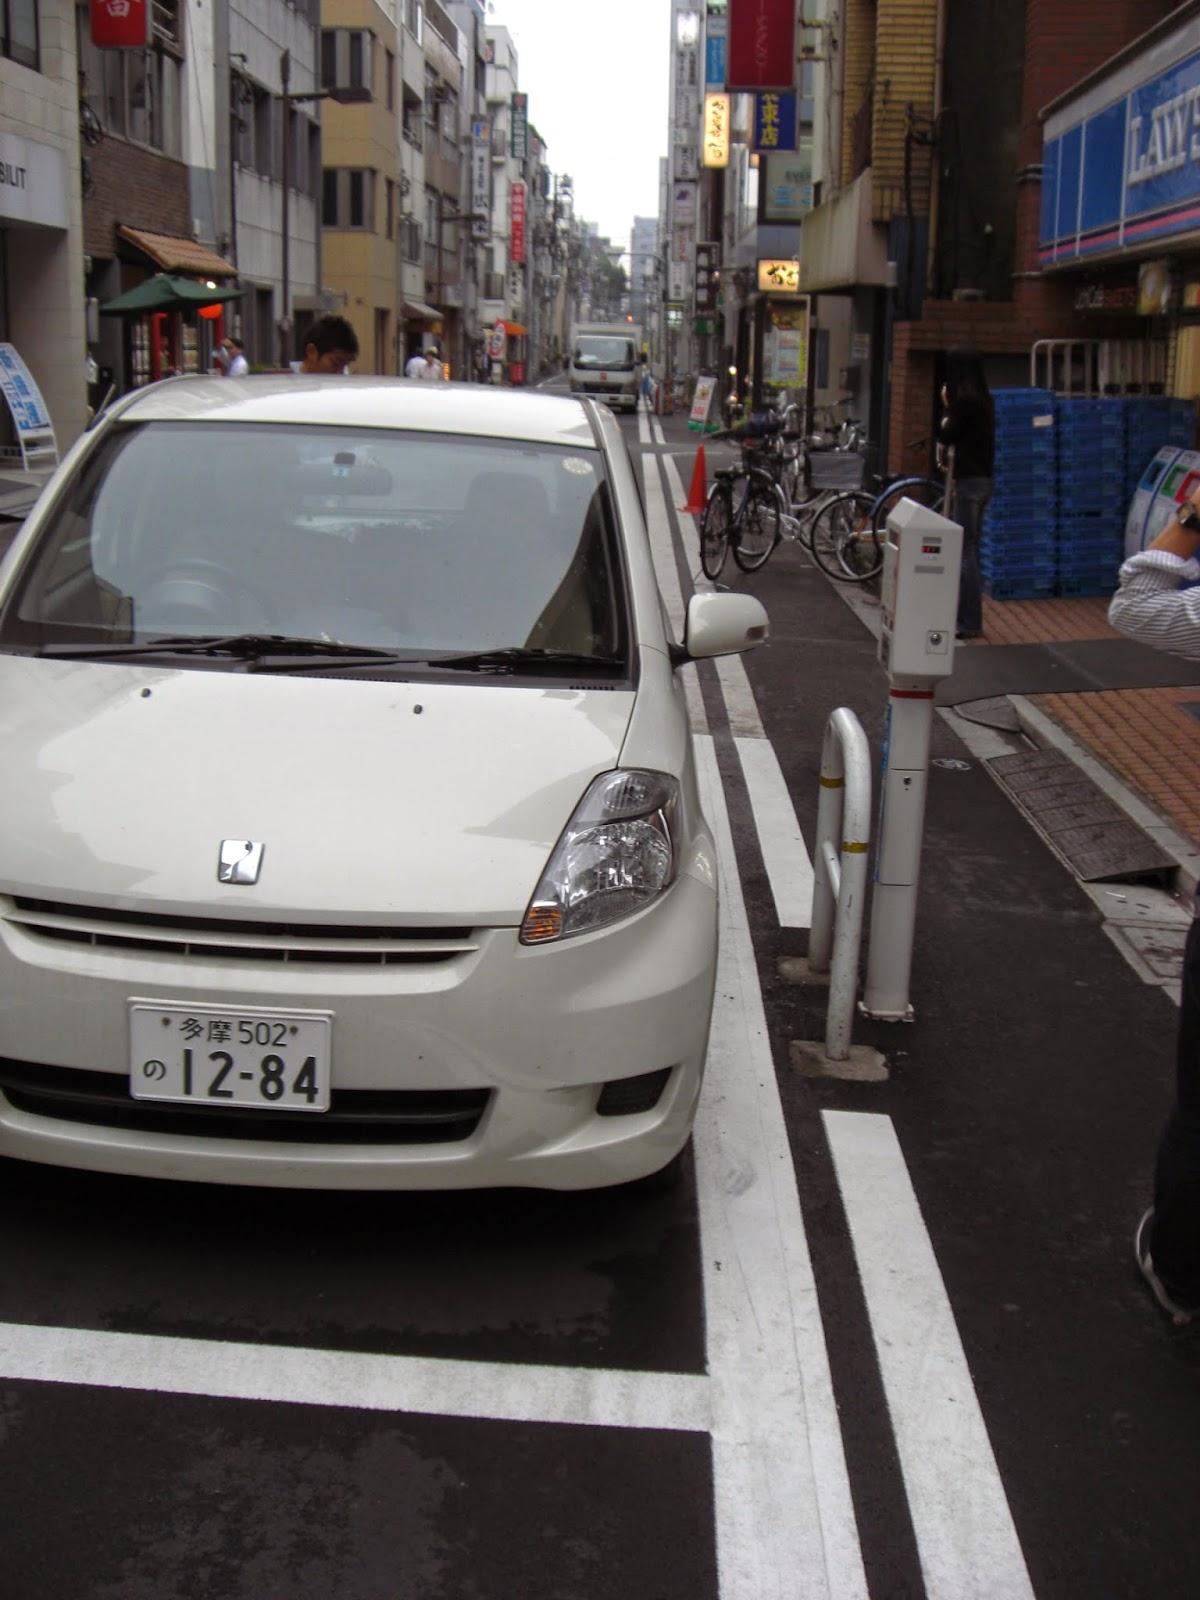 Car parking stickers design india - Parking Meter Parking In Tokyo